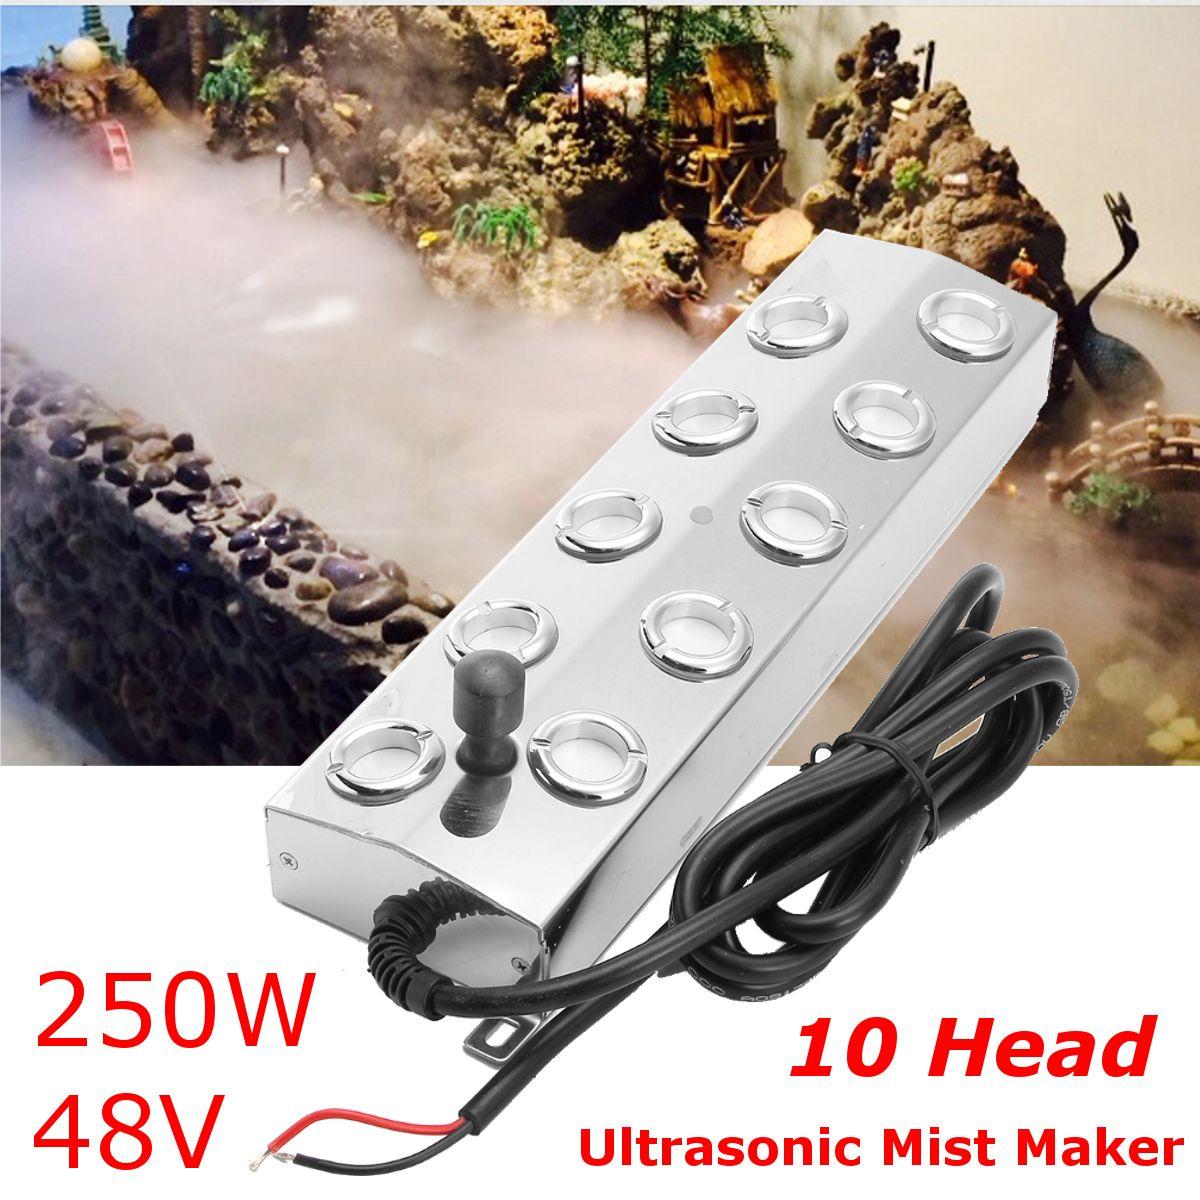 STON 10 Head Ultrasonic Mist Maker Fogger Water Atomizer Industry Air Humidifier